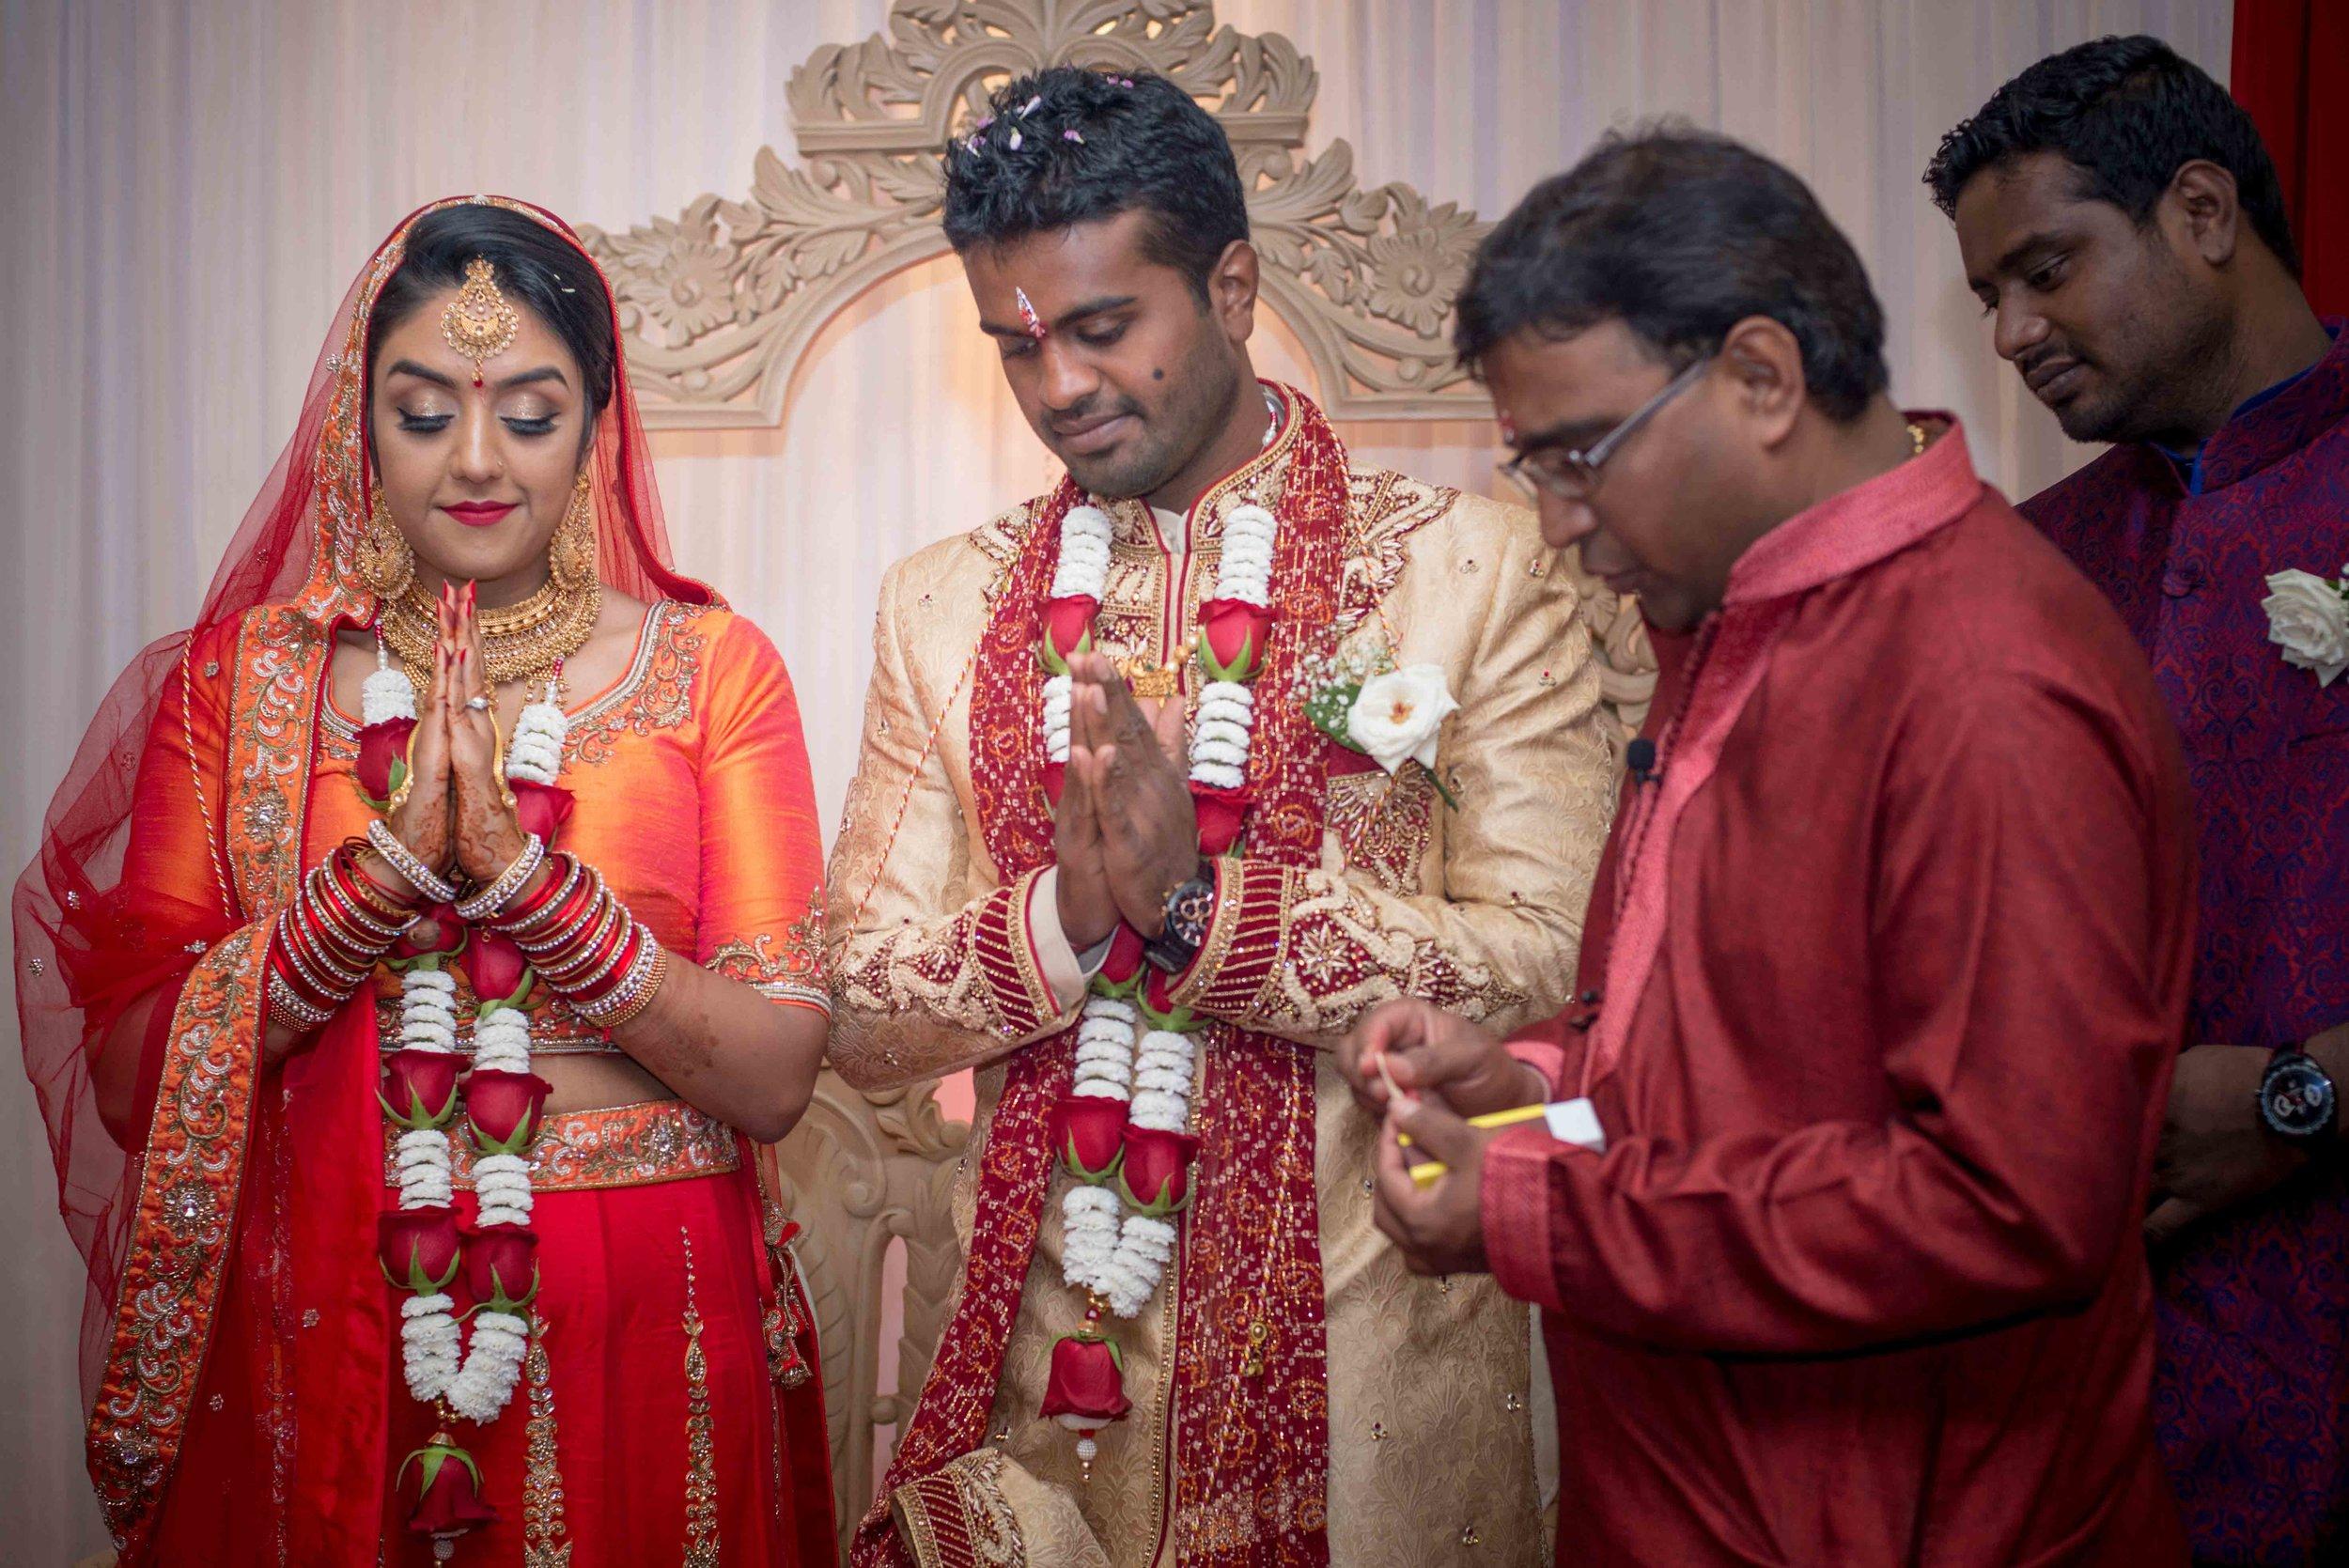 premier-banquetting-london-Hindu-asian-wedding-photographer-natalia-smith-photography-33.jpg